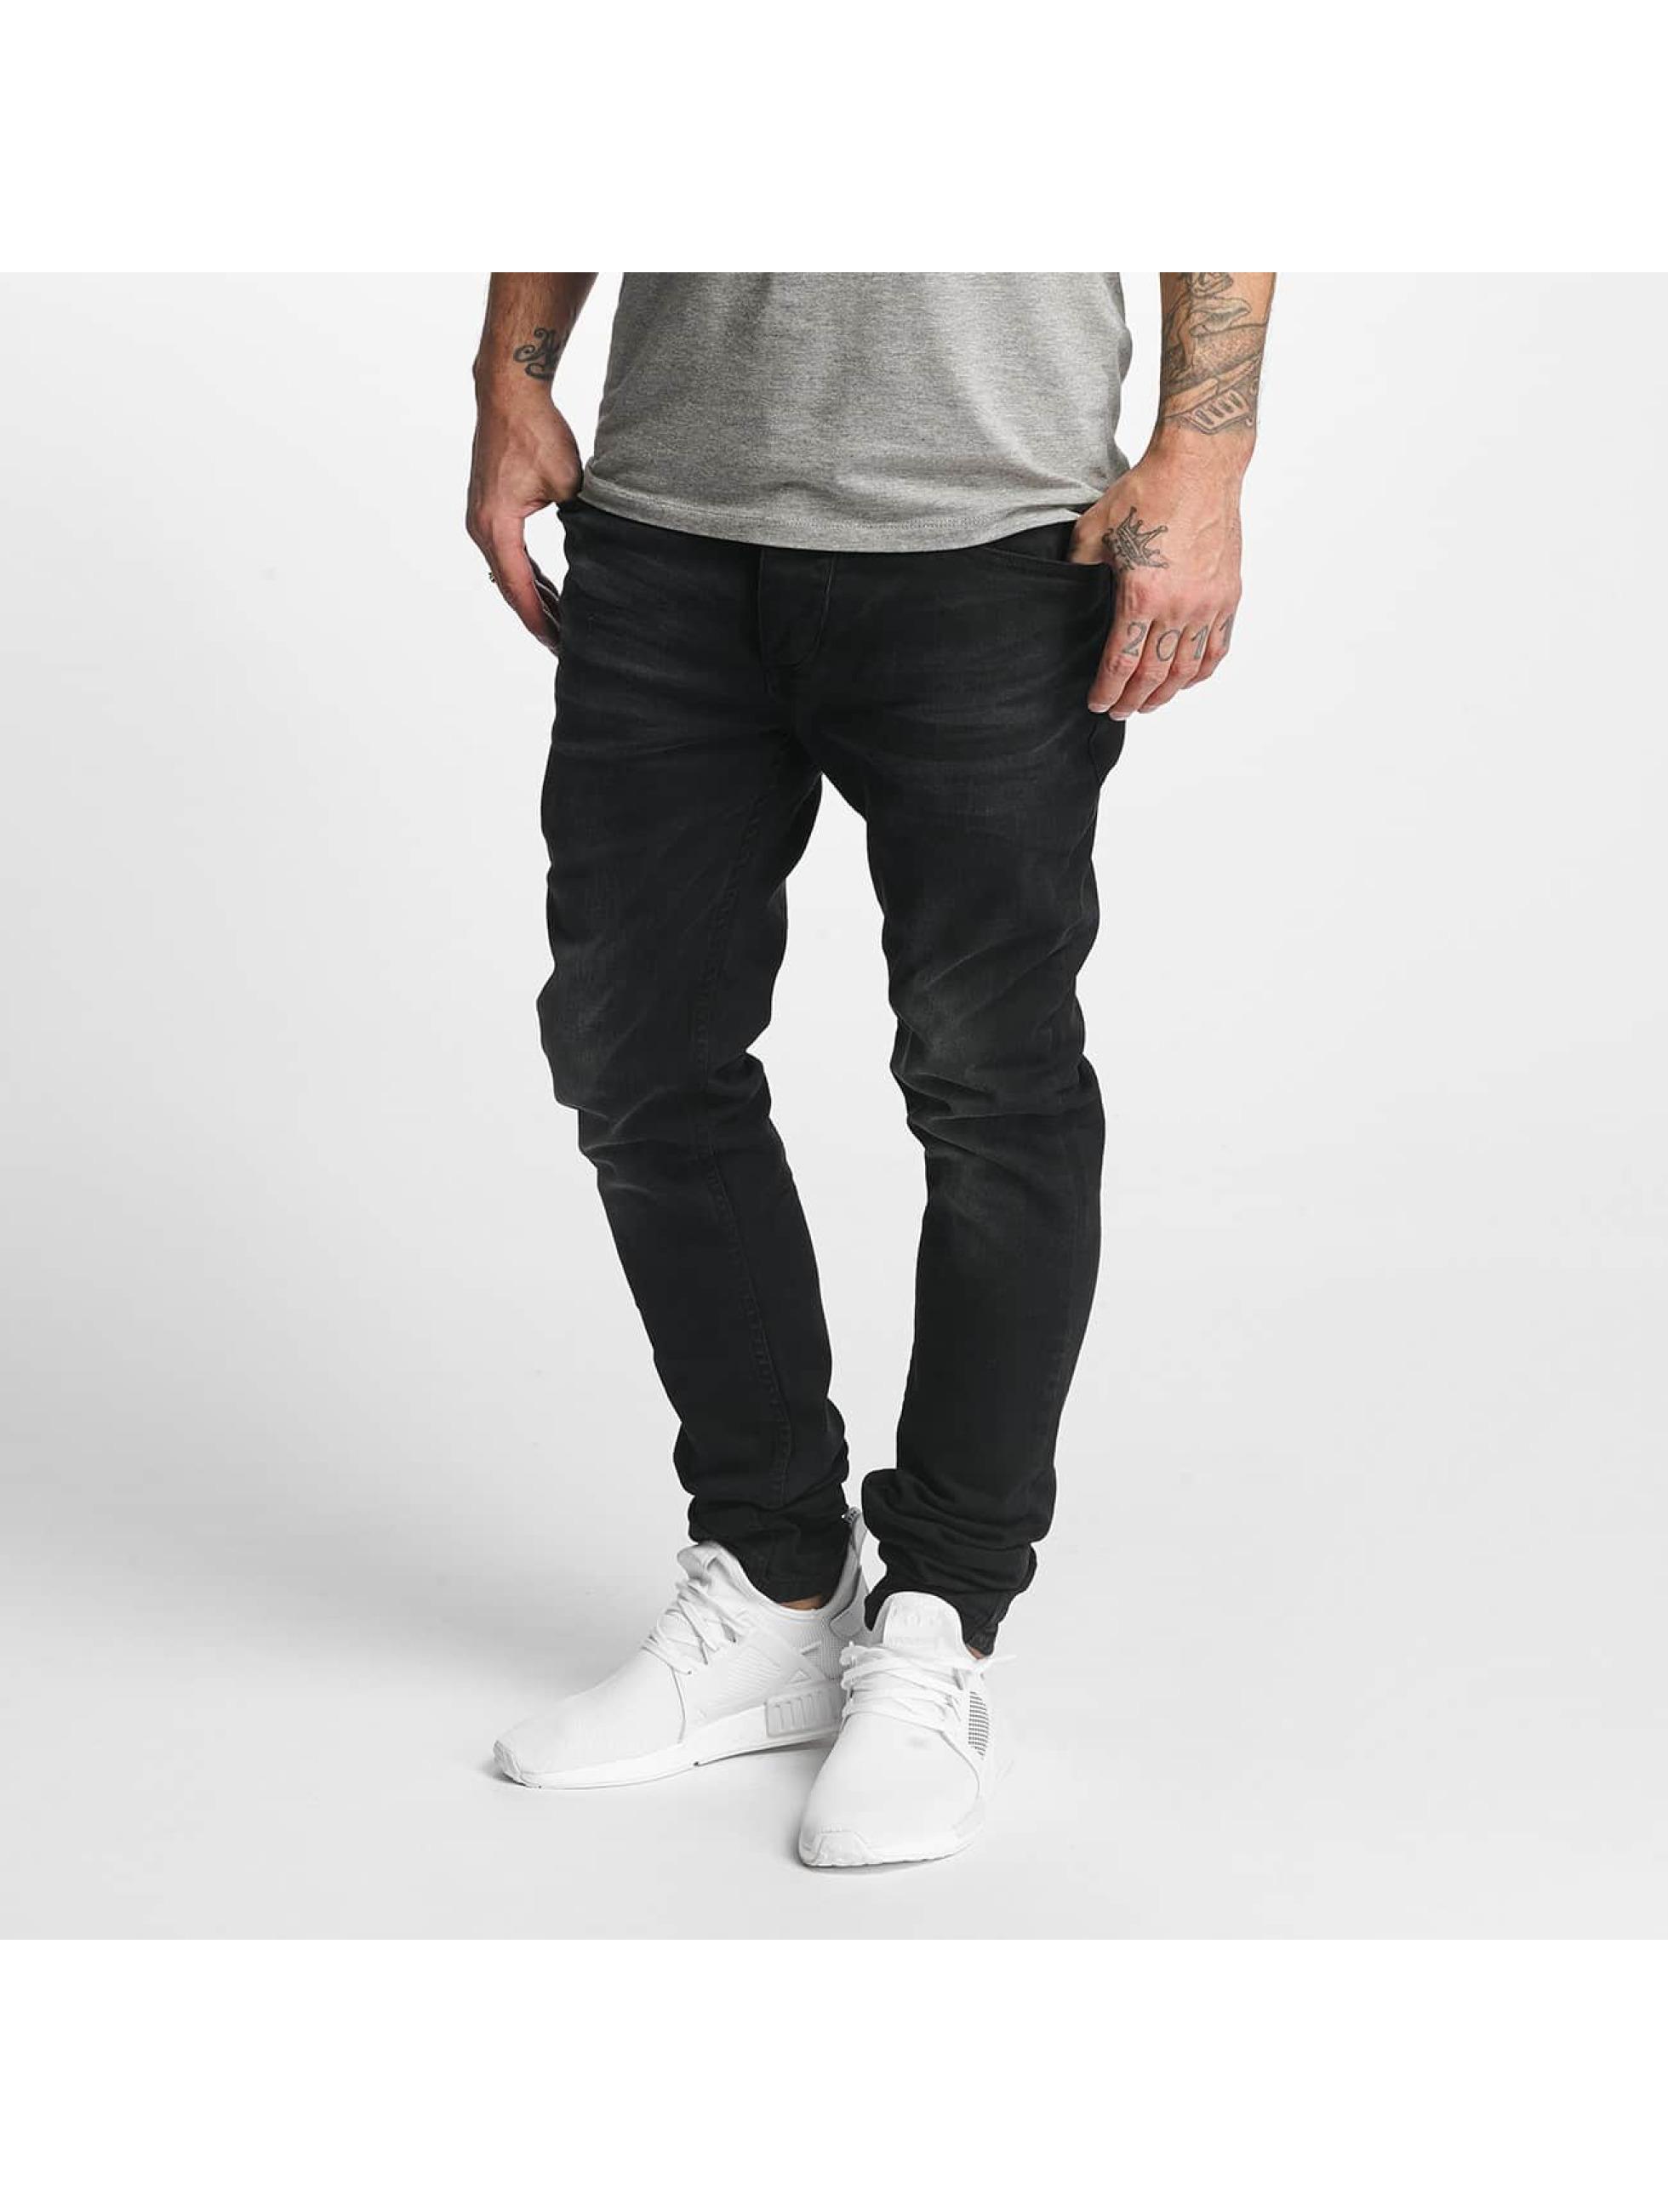 ID Denim Männer Straight Fit Jeans Skinny Low Rise Tapered Leg in schwarz